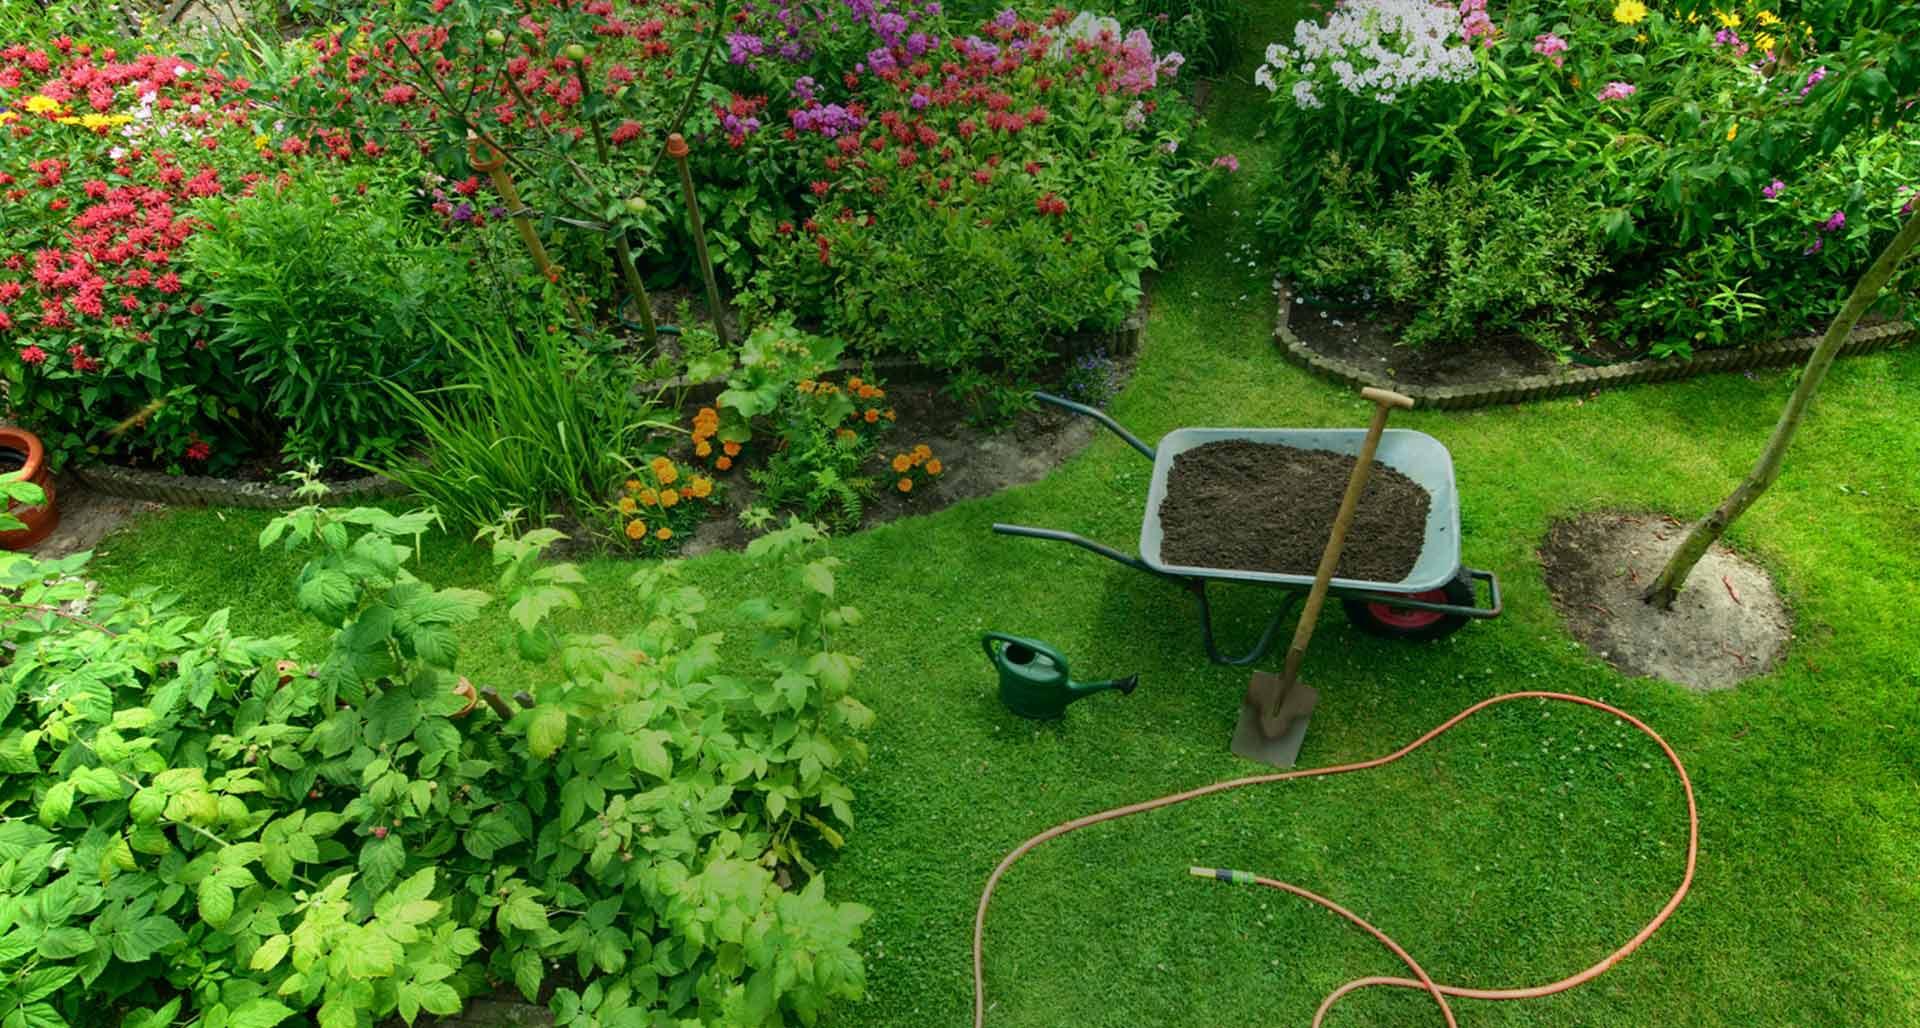 Jardineries Truffaut : Spécialiste Jardin, Animaux, Maison ... serapportantà Acheter Un Jardin Potager